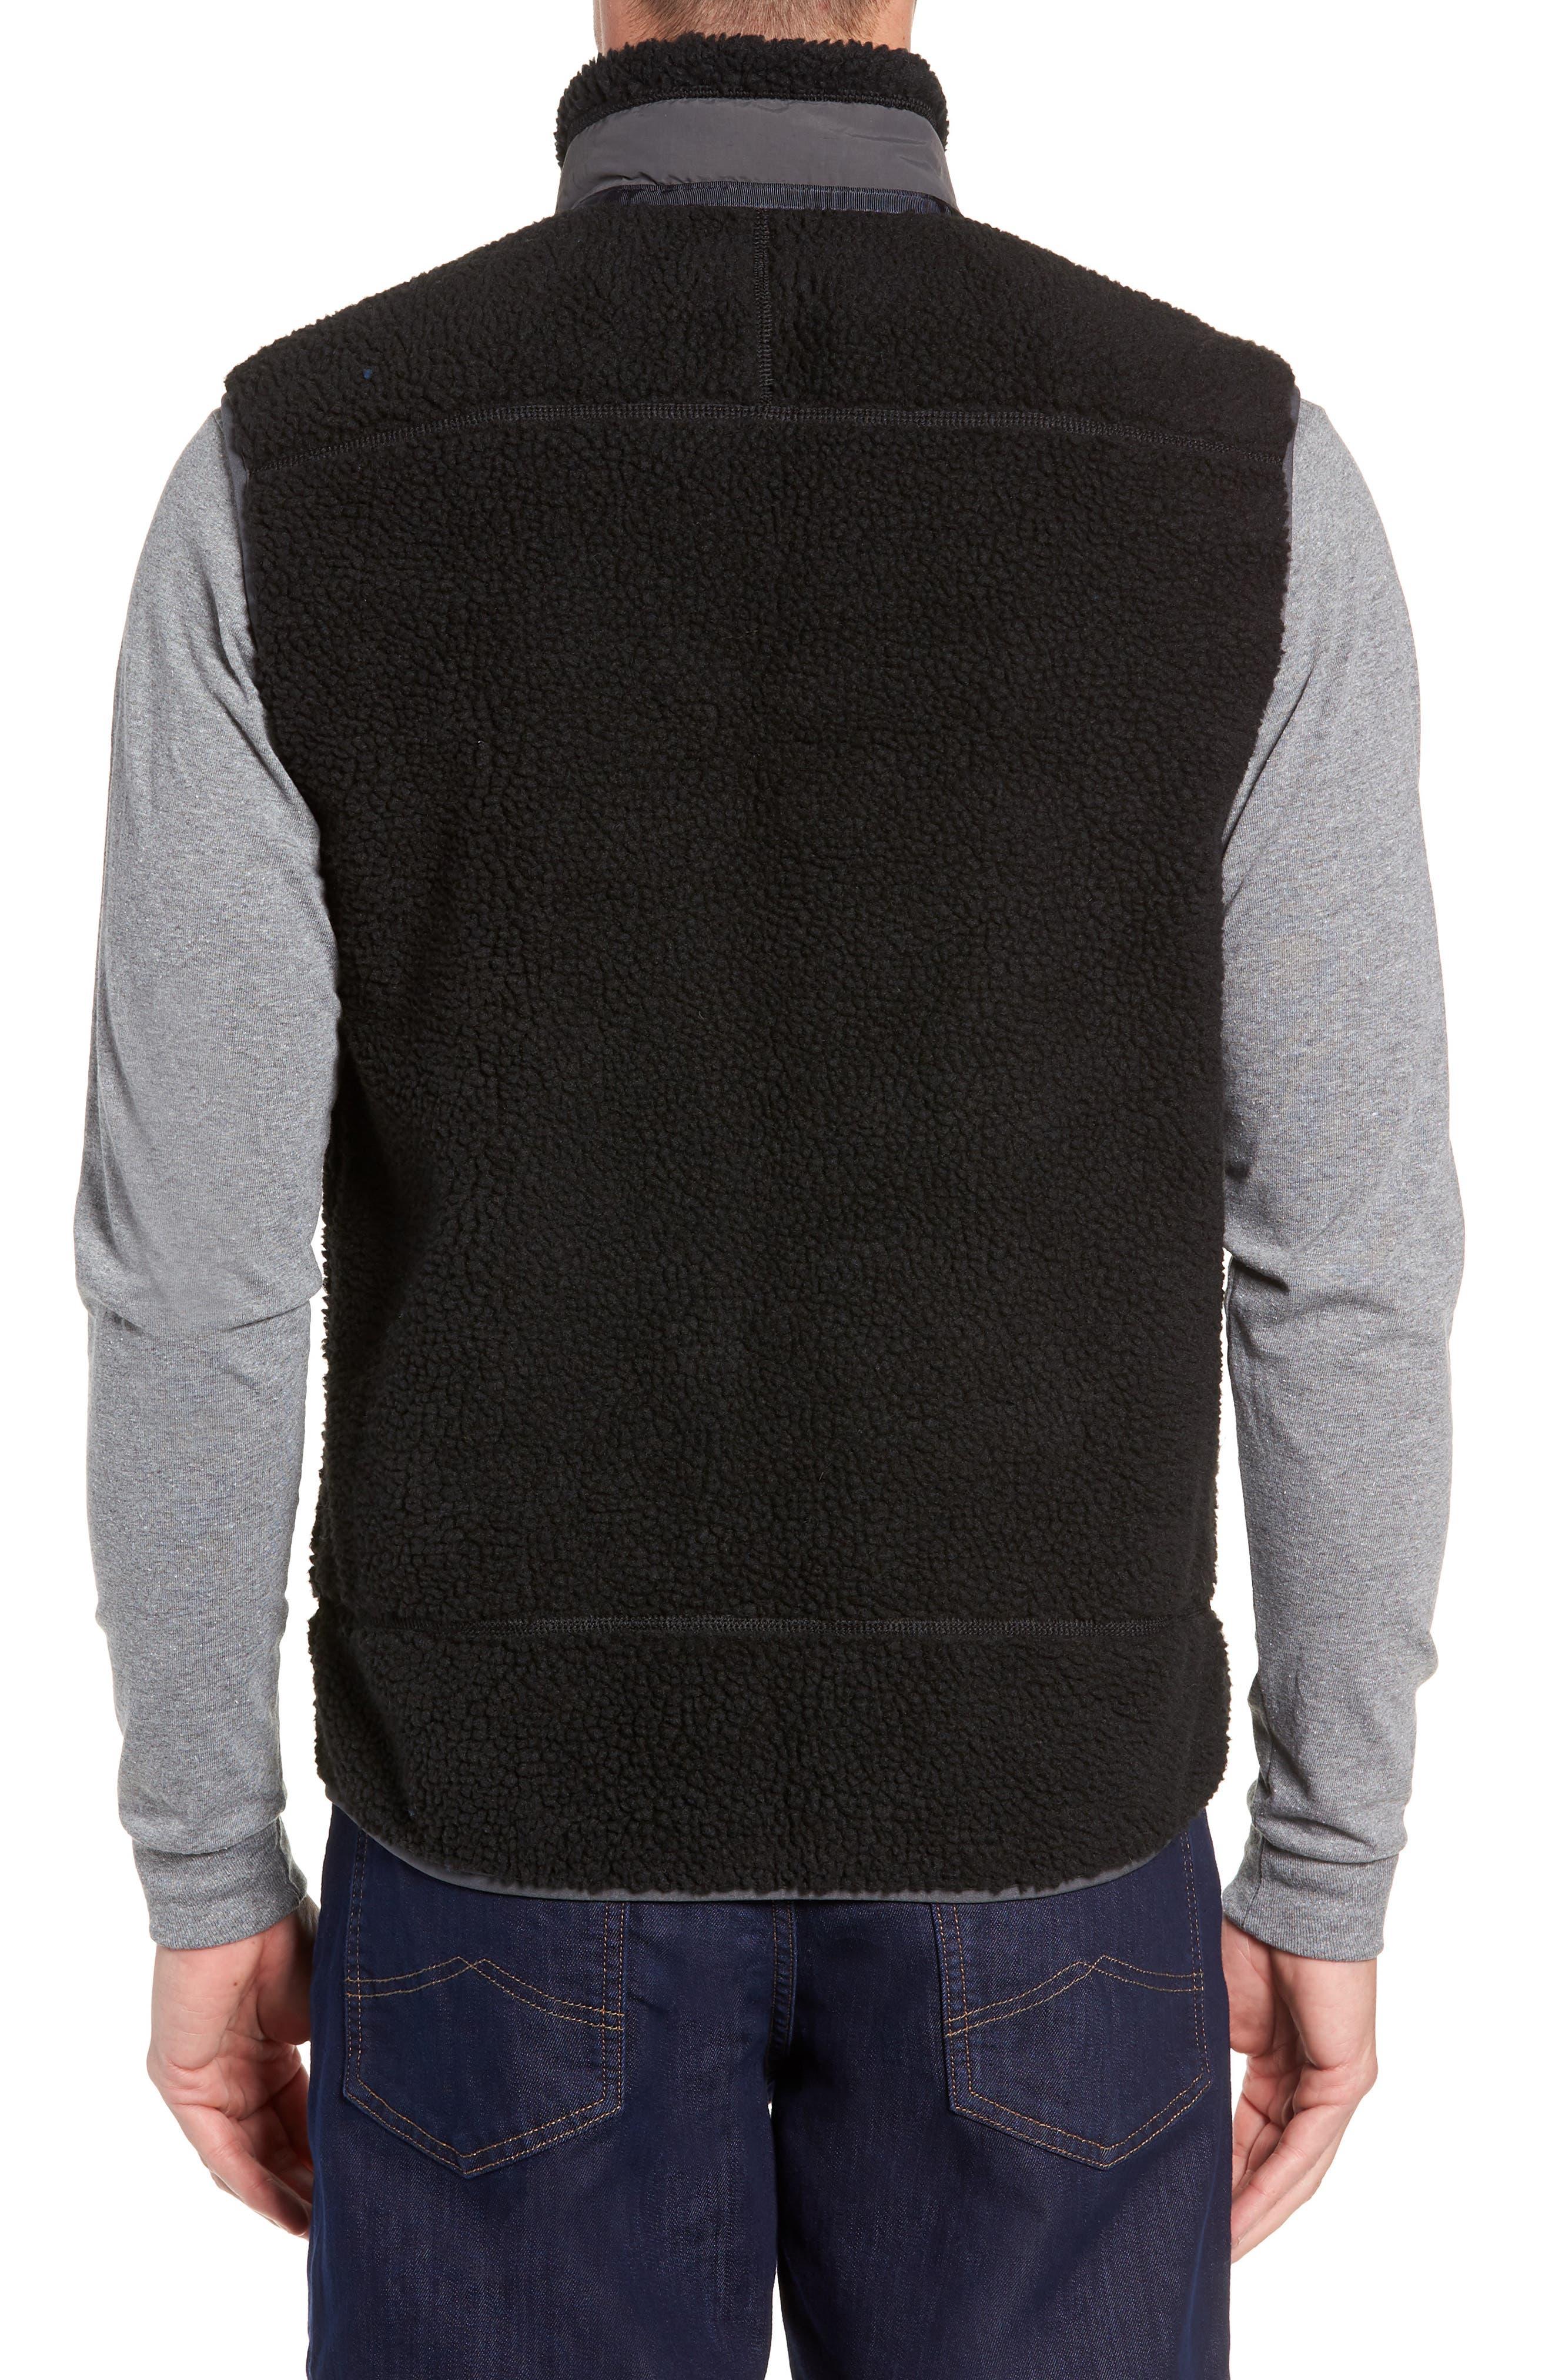 Classic Retro-X<sup>®</sup> Windproof Vest,                             Alternate thumbnail 2, color,                             002